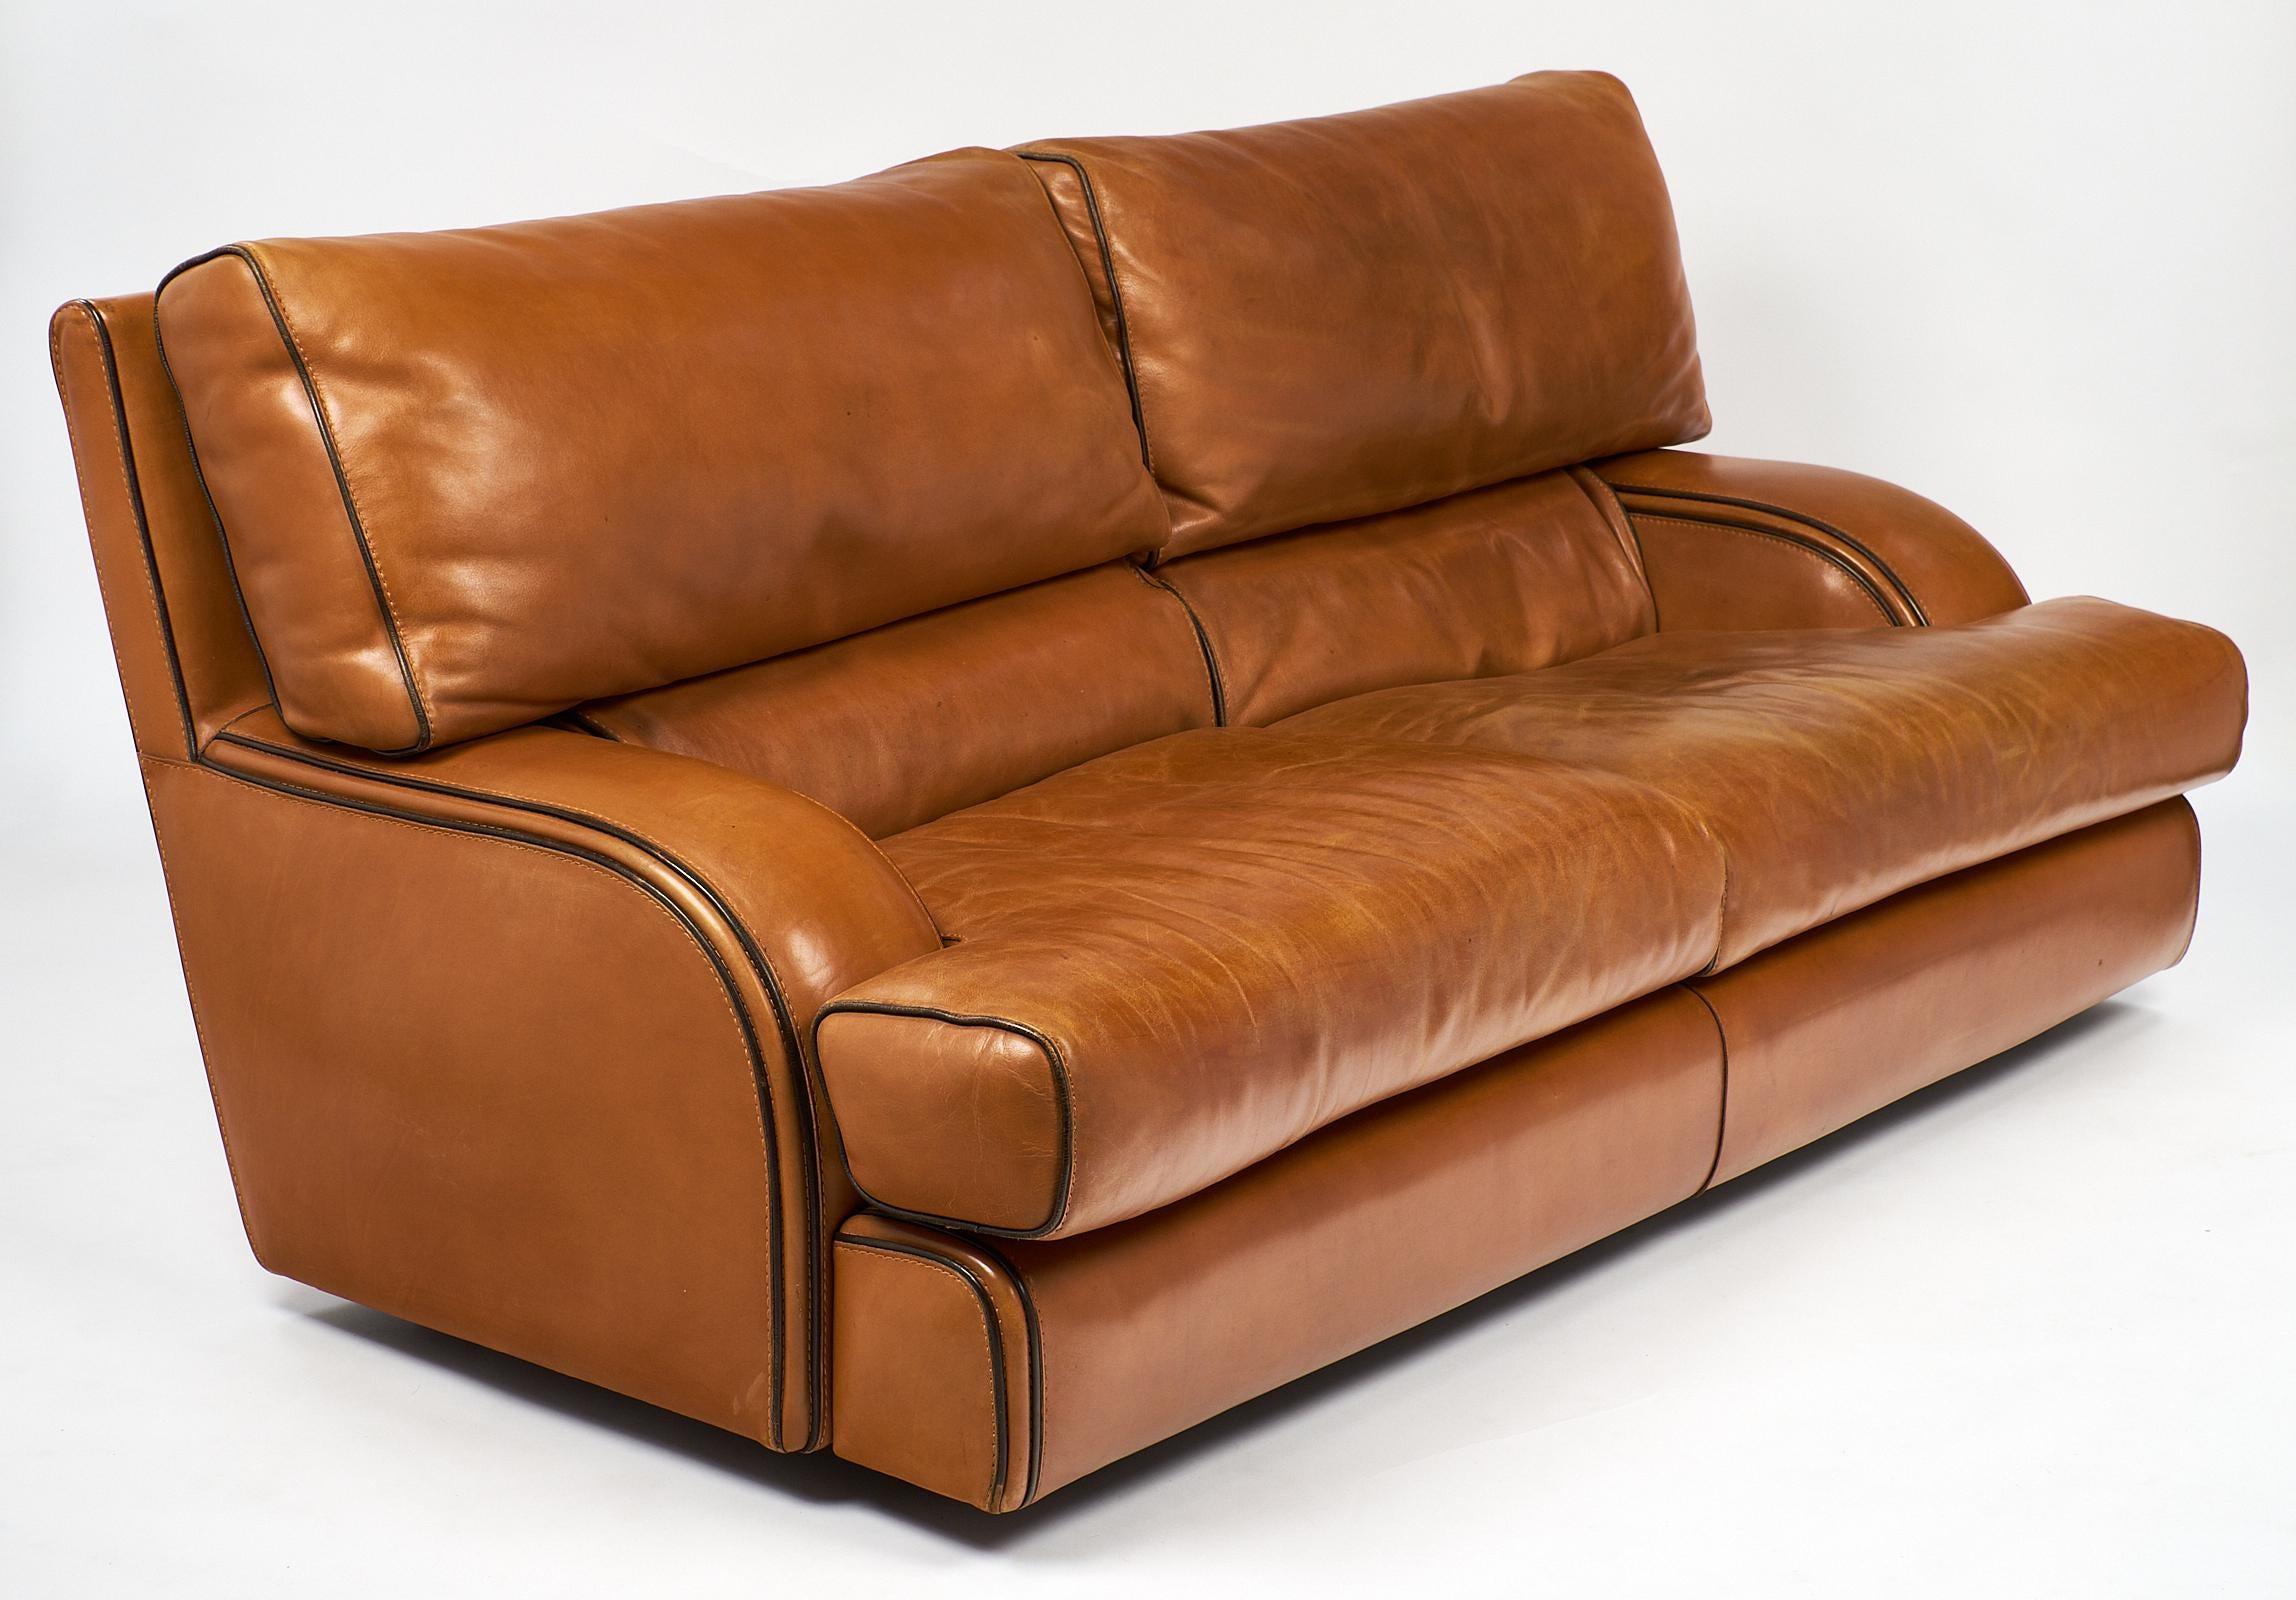 vintage baxter italian leather sofa image 3 of 10